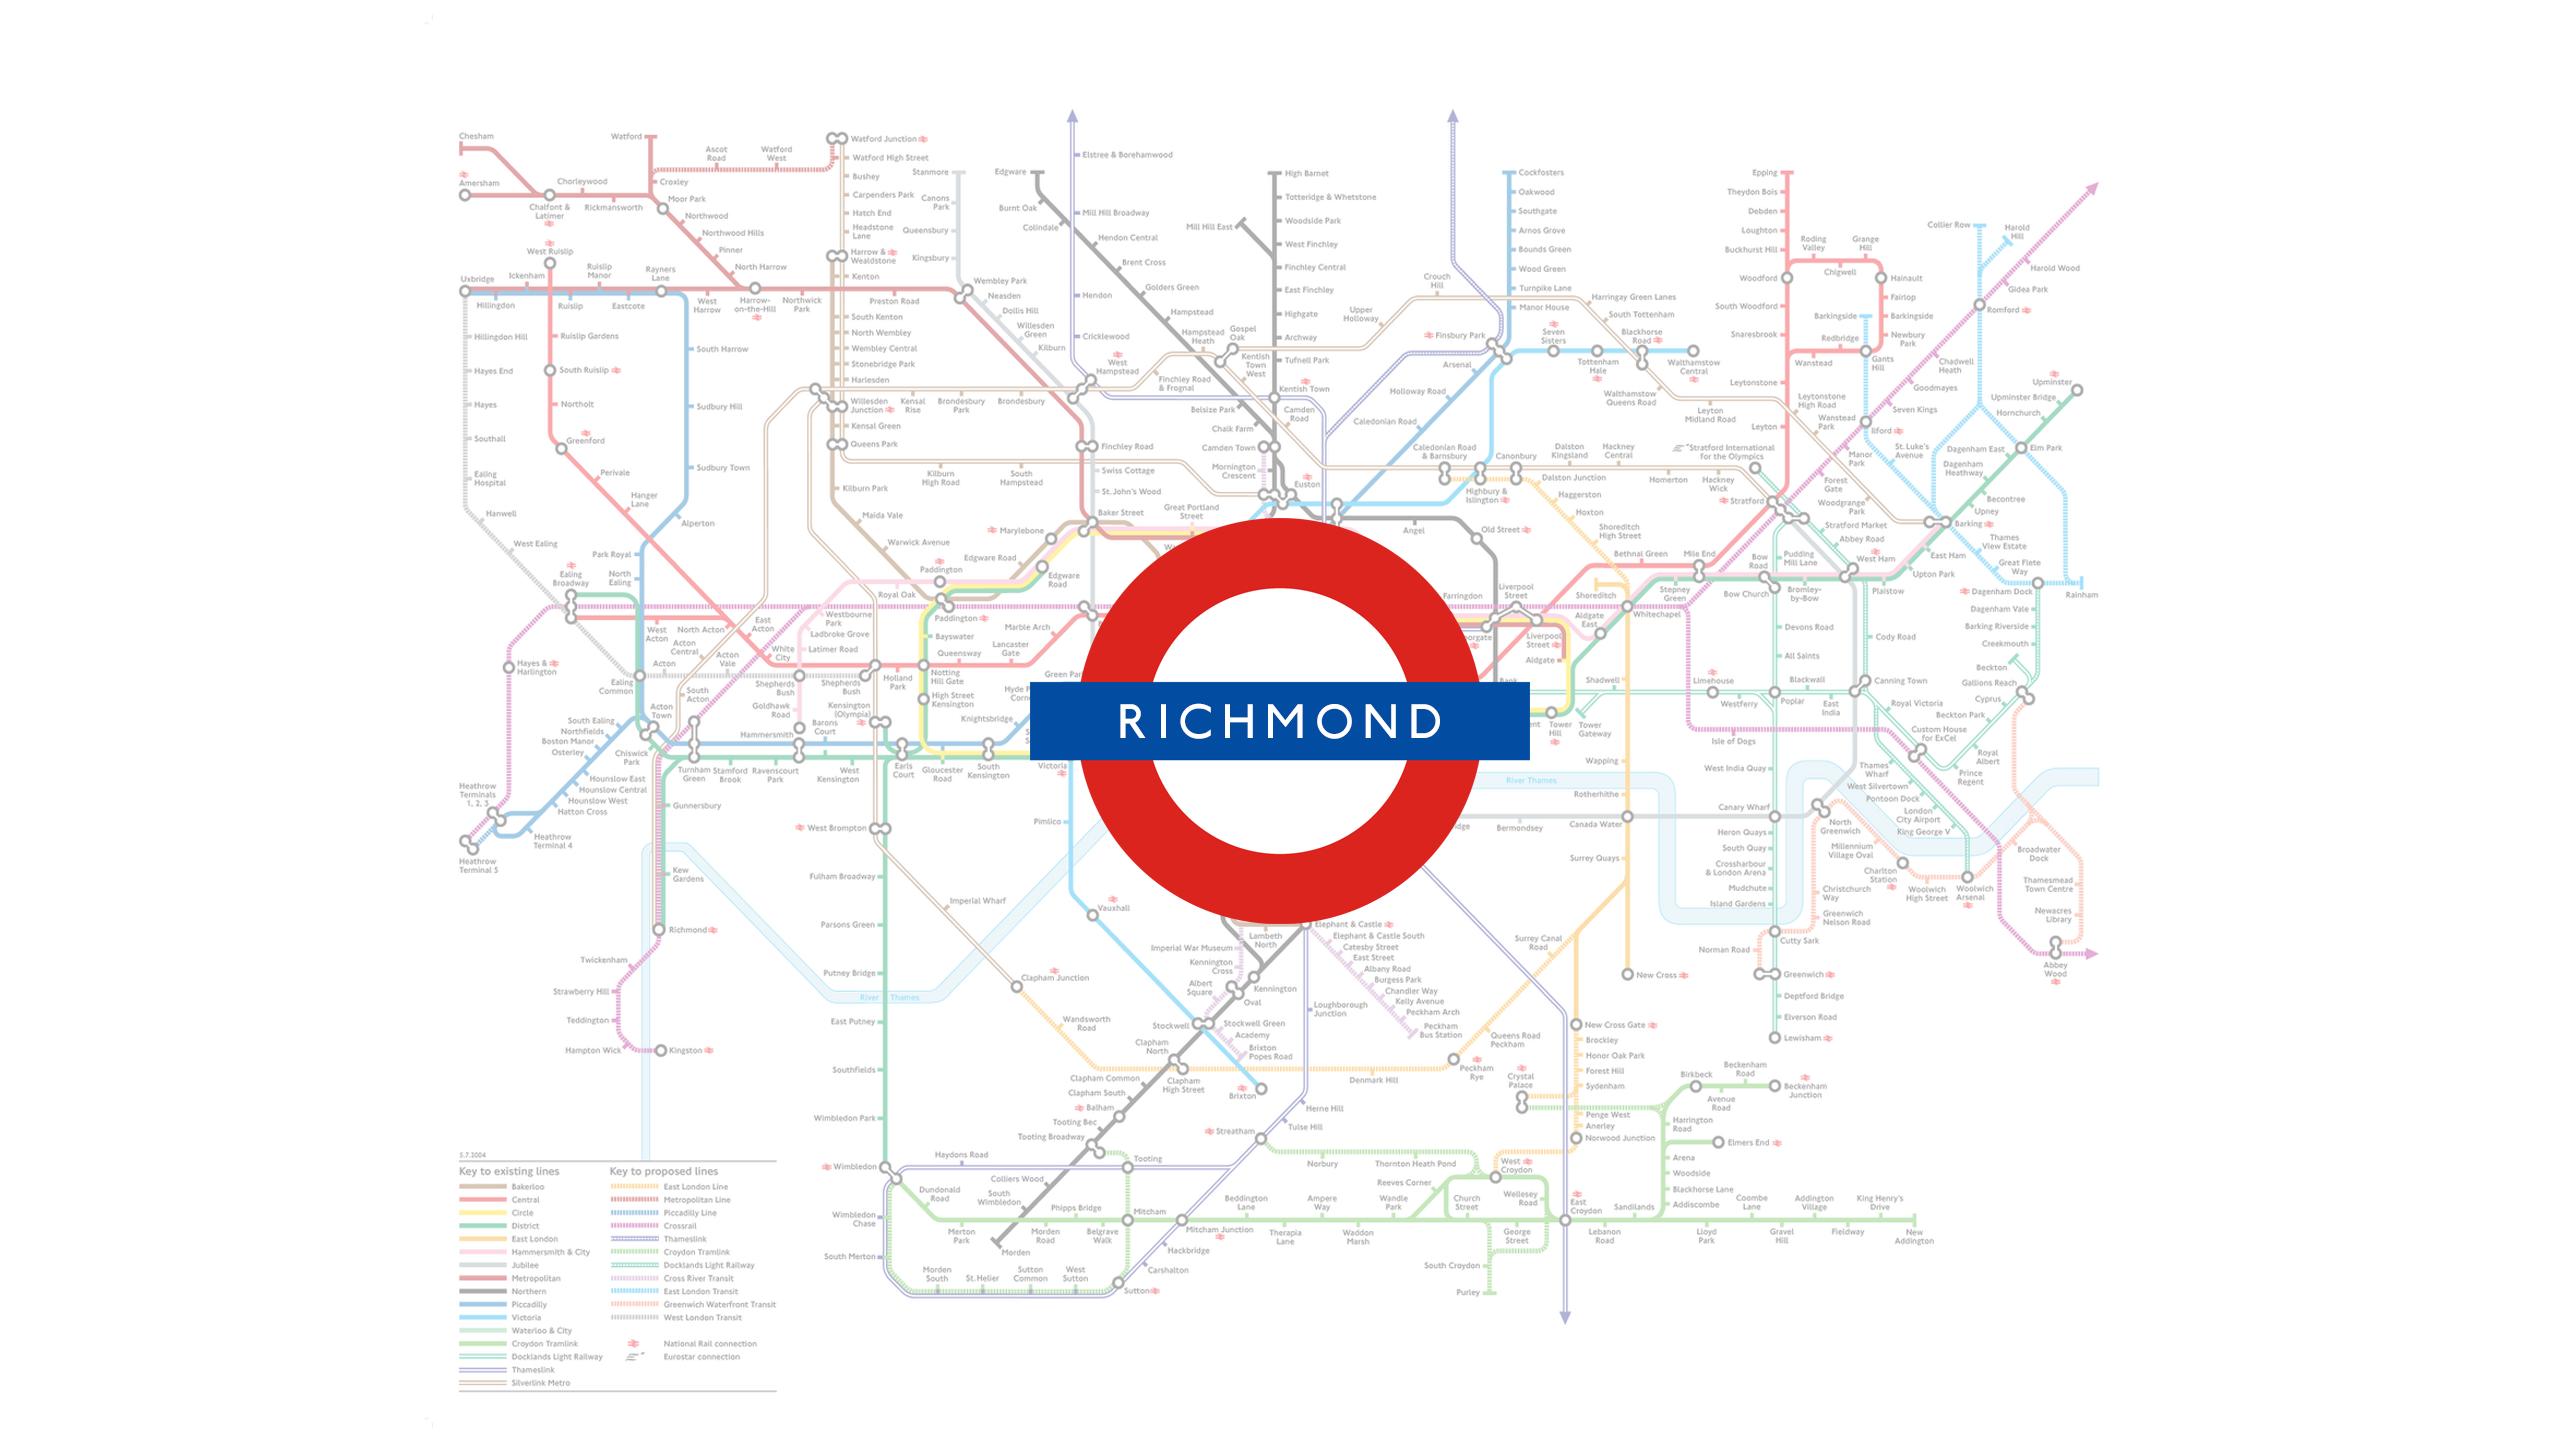 Richmond (Map)